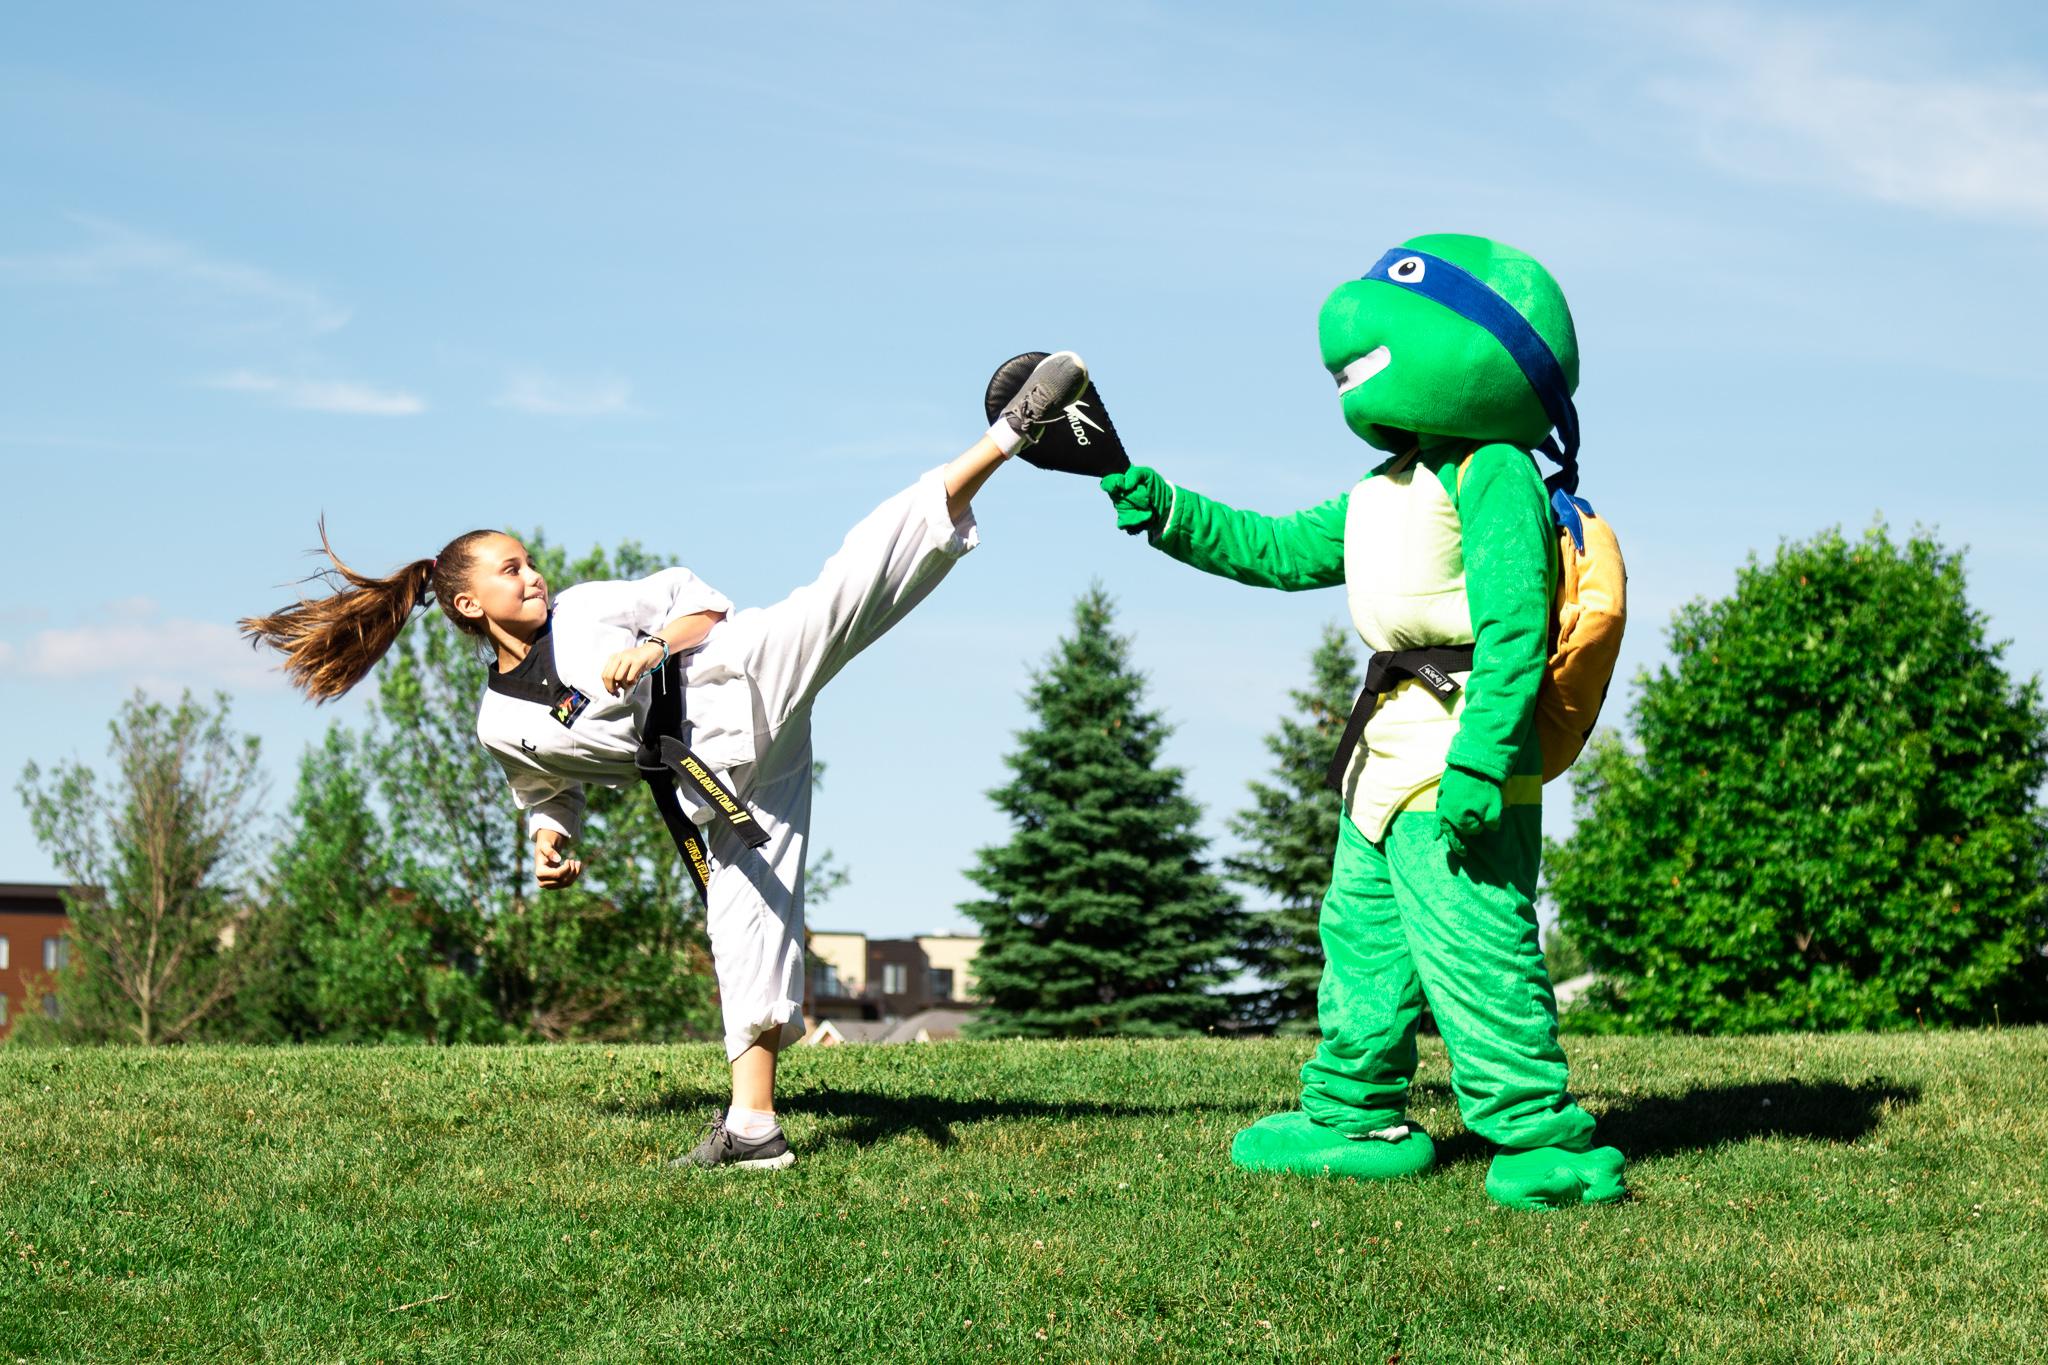 A girl kicking a target held by a teenage mutant ninja turtle